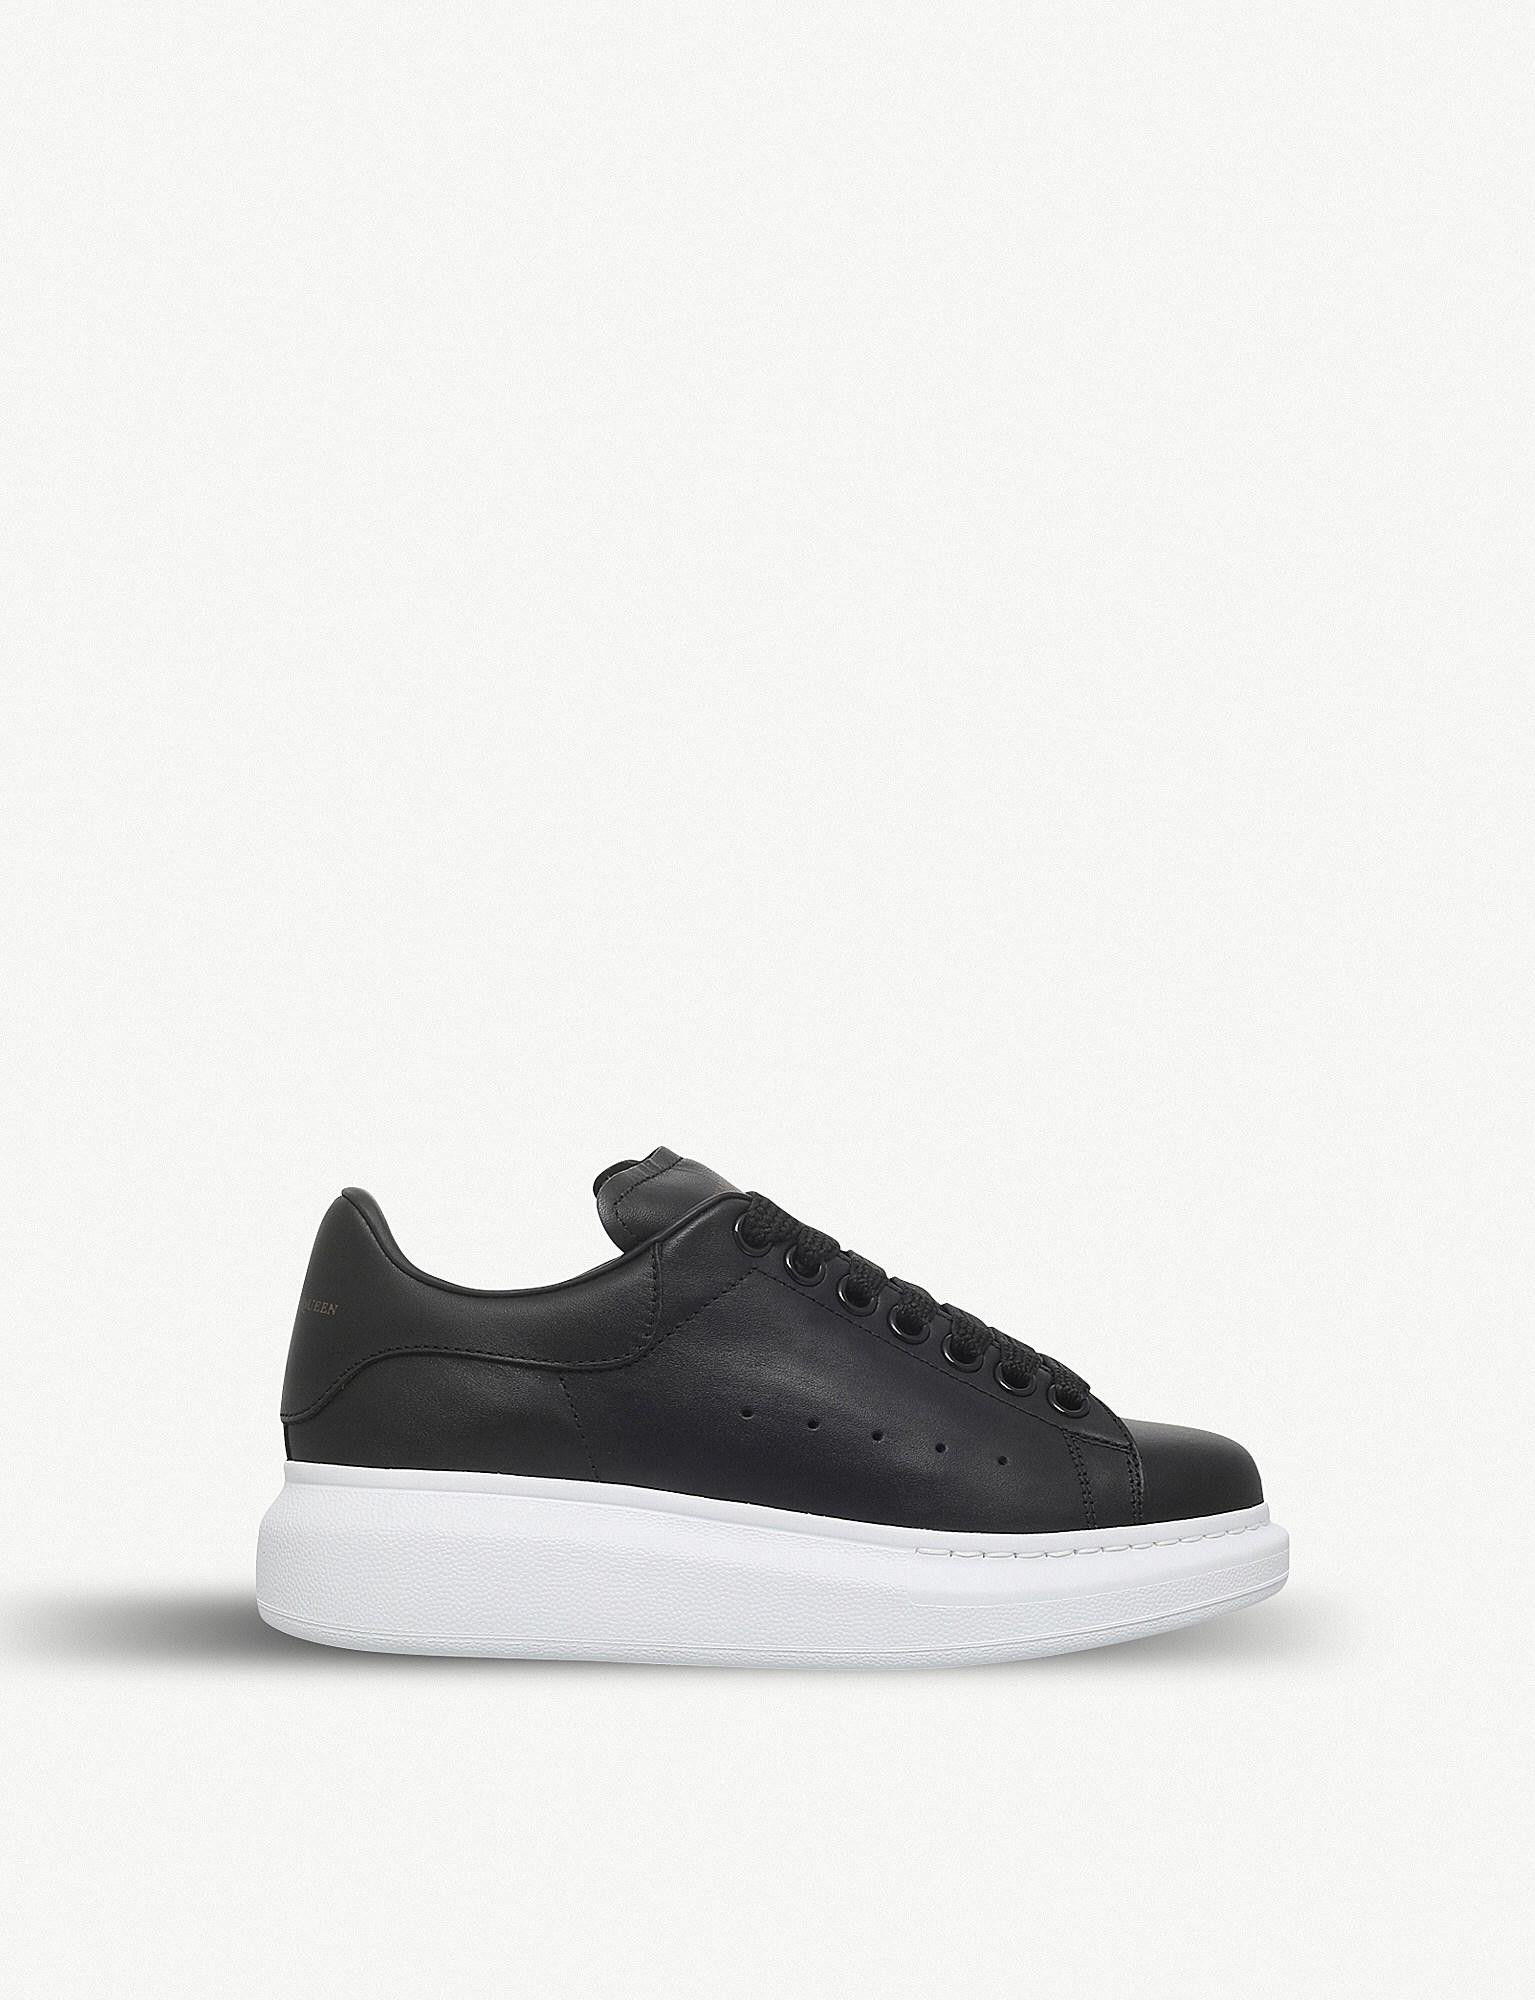 0aa6aa05fe2 https   www.lyst.com shoes alexander-mcqueen-runway-leather ...